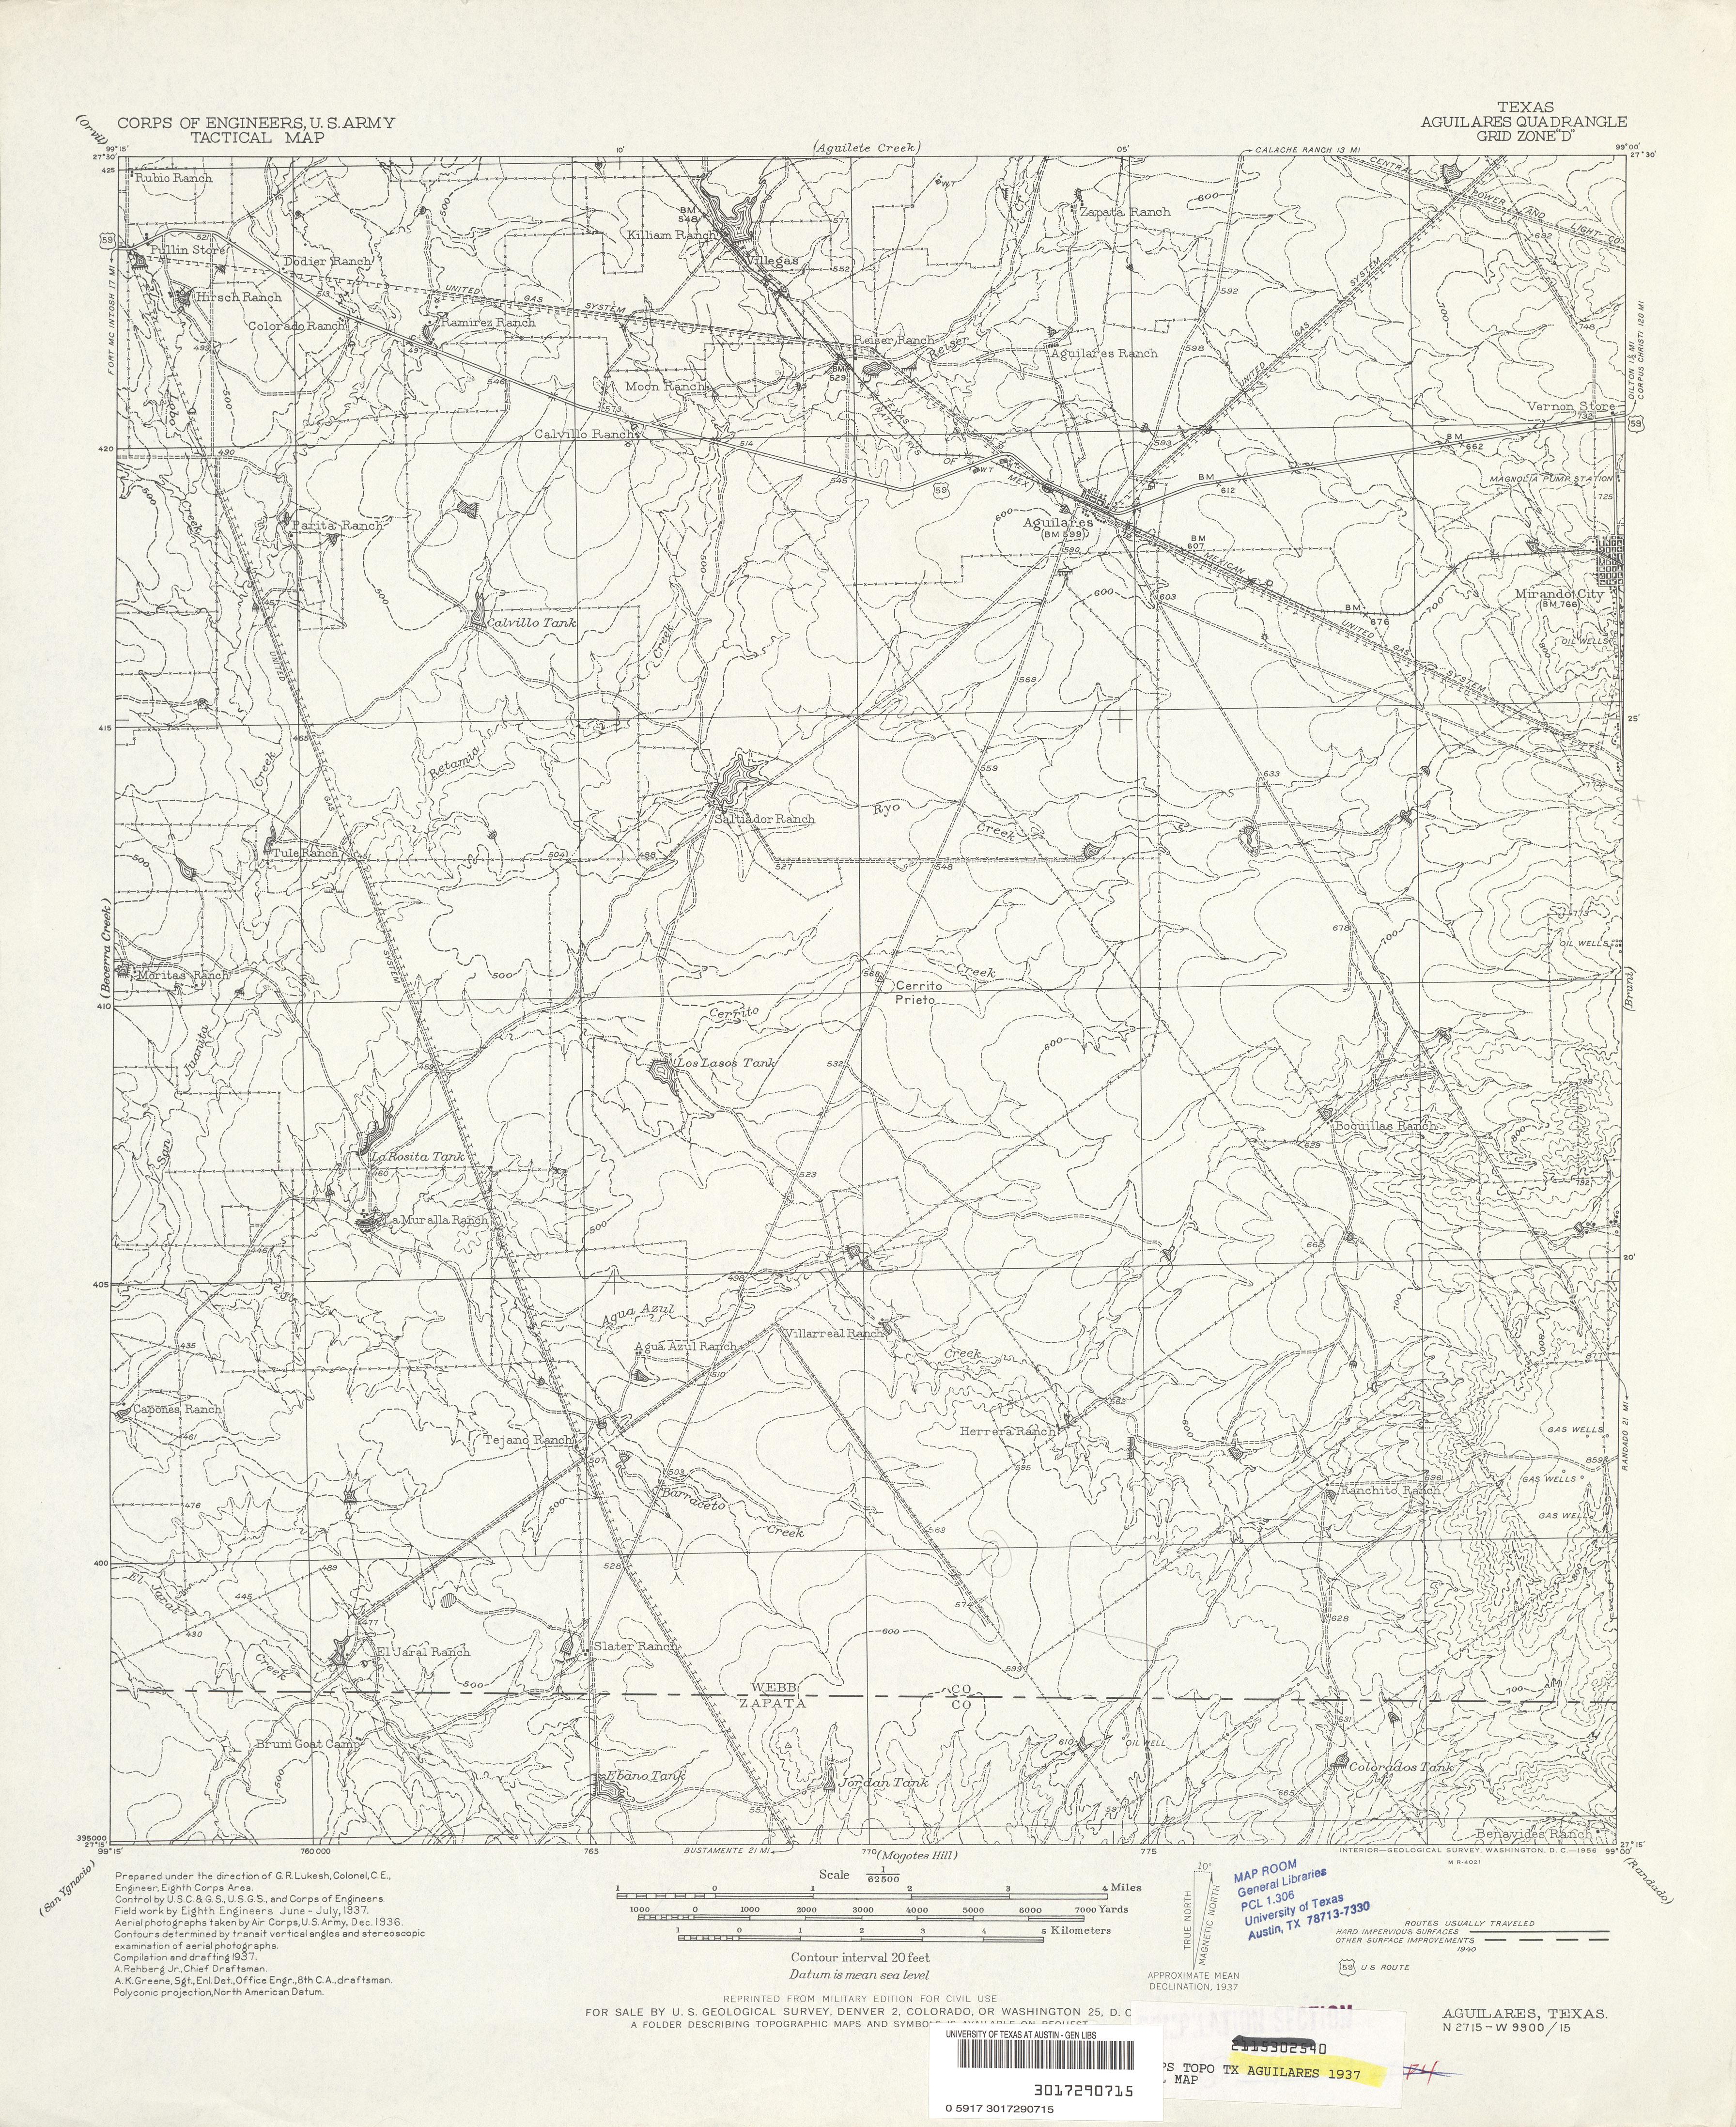 1940 Overprint 4 0 Mb U S Army Corps Of Engineers